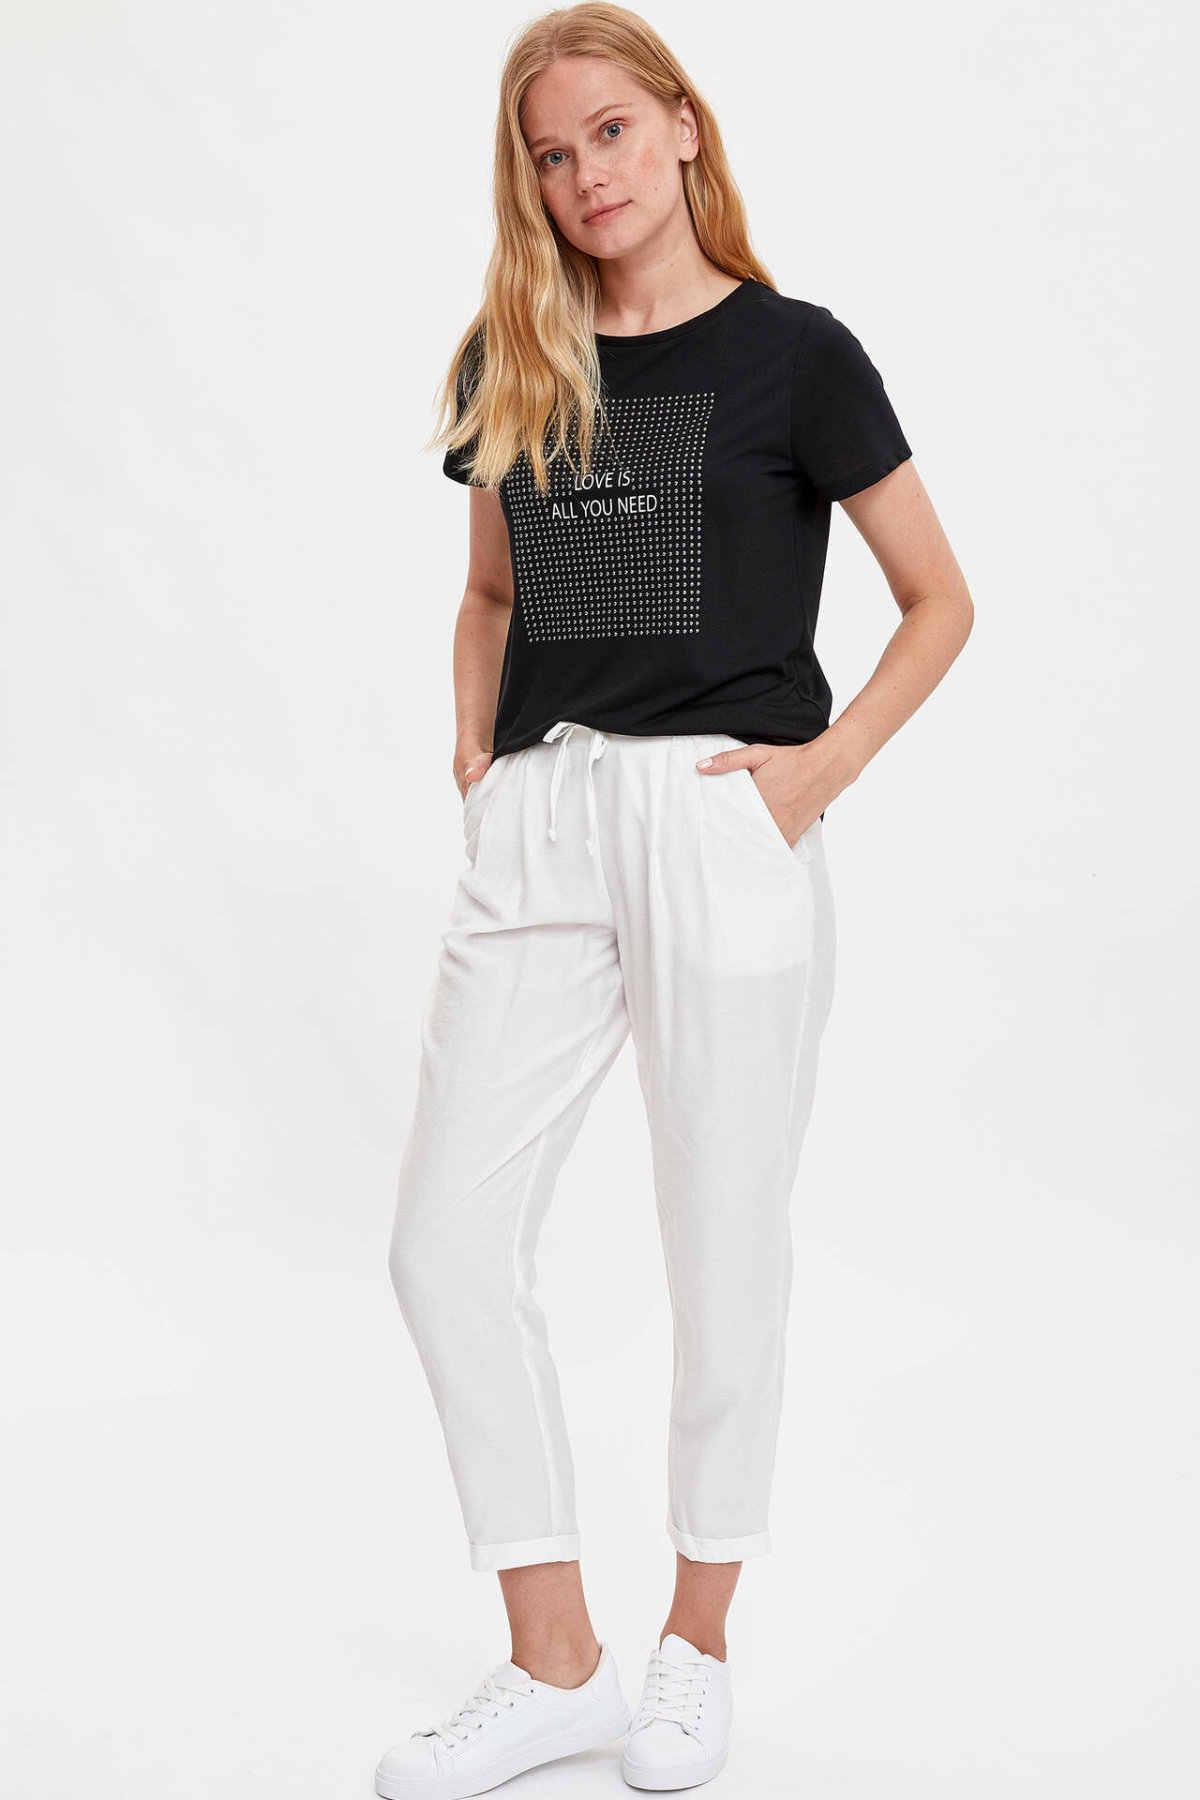 Defacto Vrouwen Crew Brief Patroon T-shirt Fashion Dames Simple Casual Korte Mouw T-shirt Vrouwen Harajuku T-shirt-L0055AZ19SM